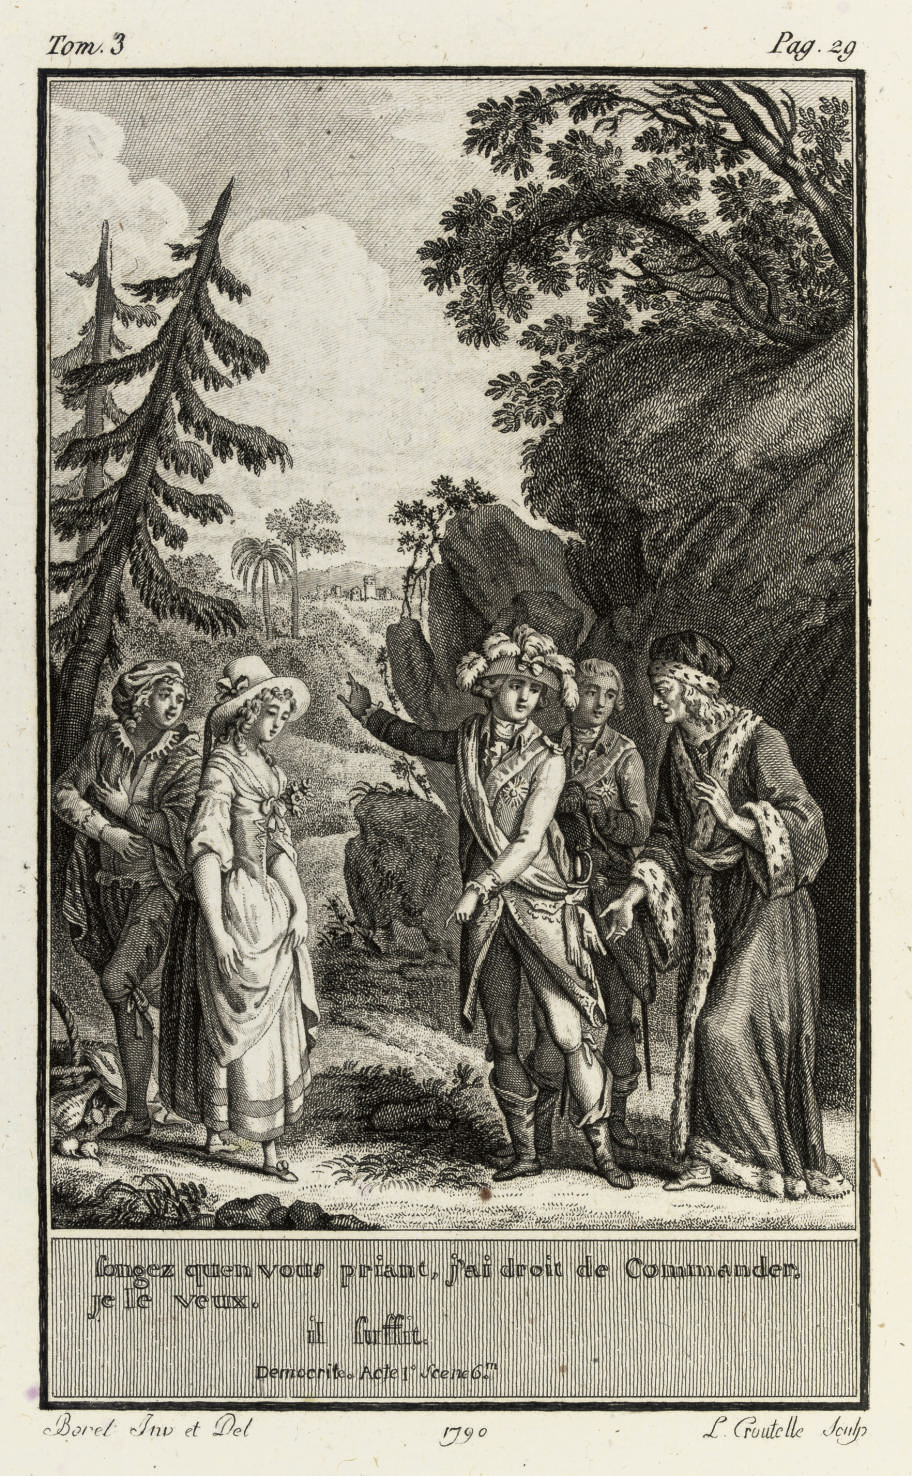 REGNARD, Jean François (1655-1